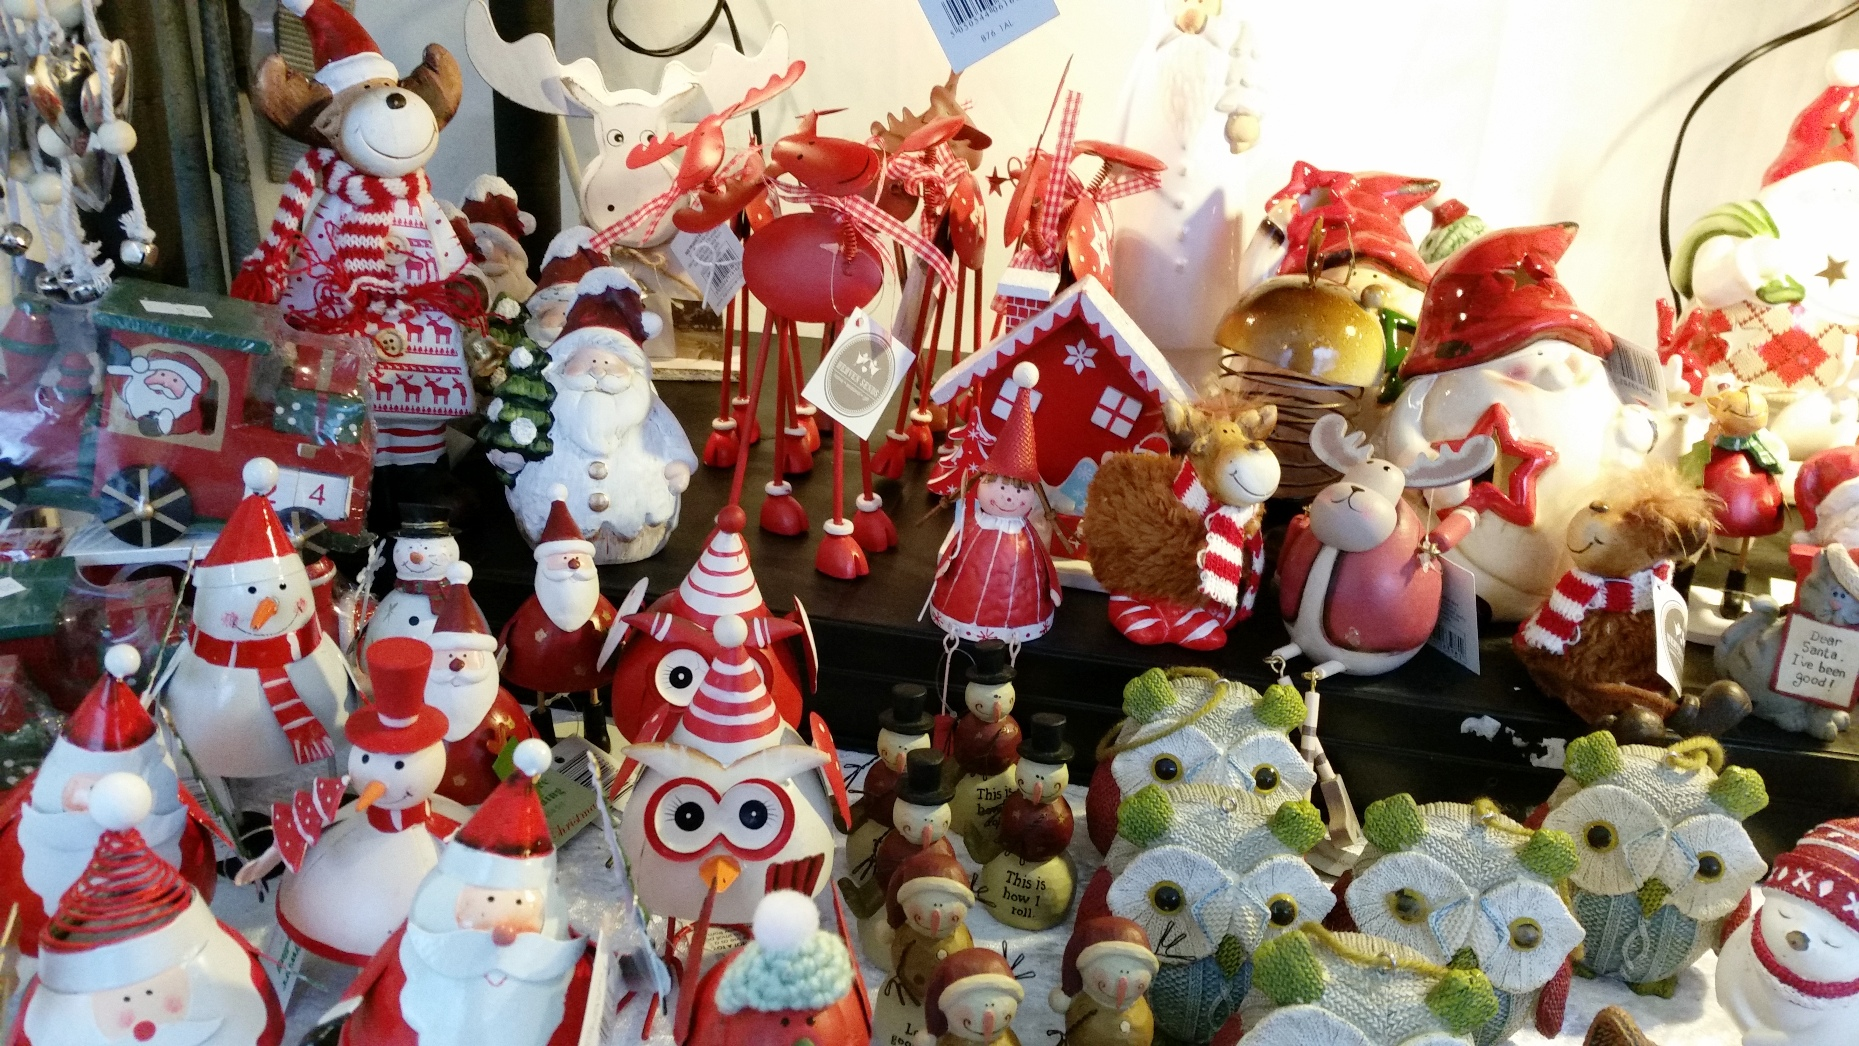 North Shields Victorian Christmas Market | Visit North Tyneside